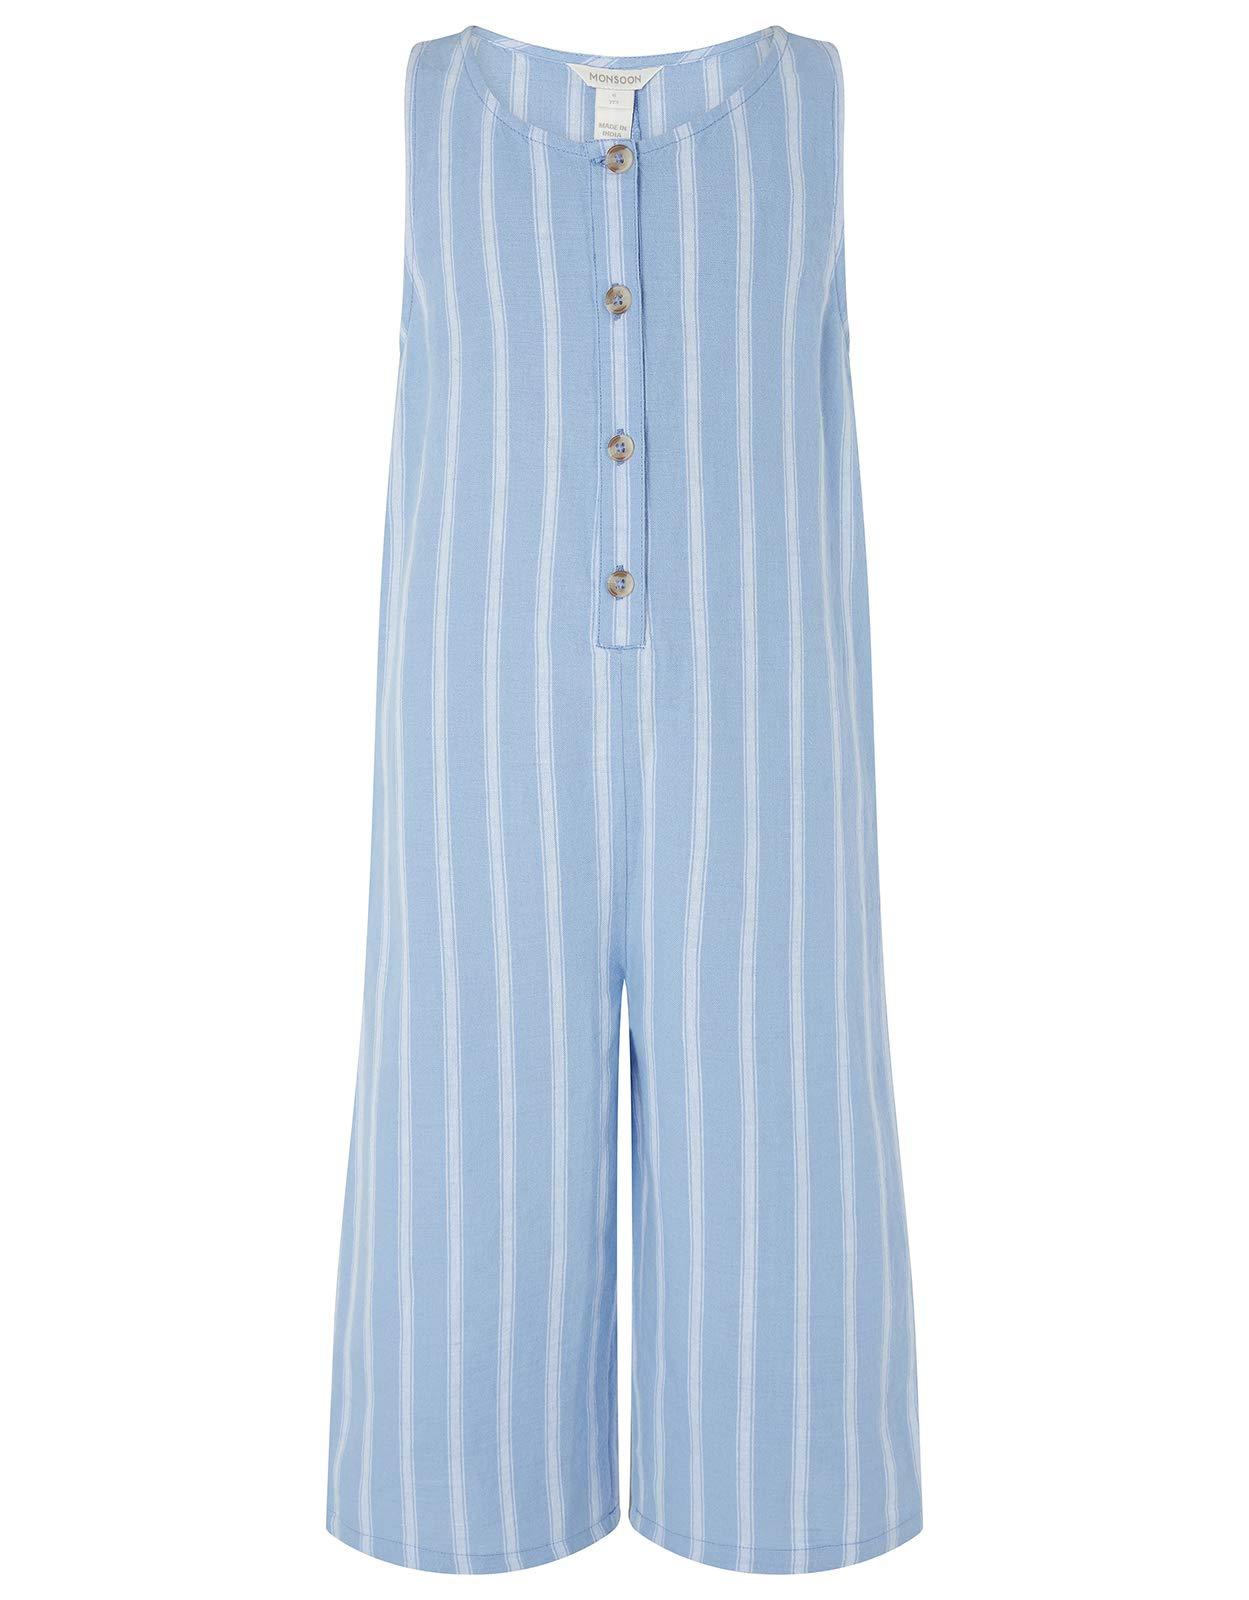 Monsoon Linen Blend Peta Romper & T-Shirt Daywear Sets - Girls - 9 Years Navy by Monsoon (Image #2)